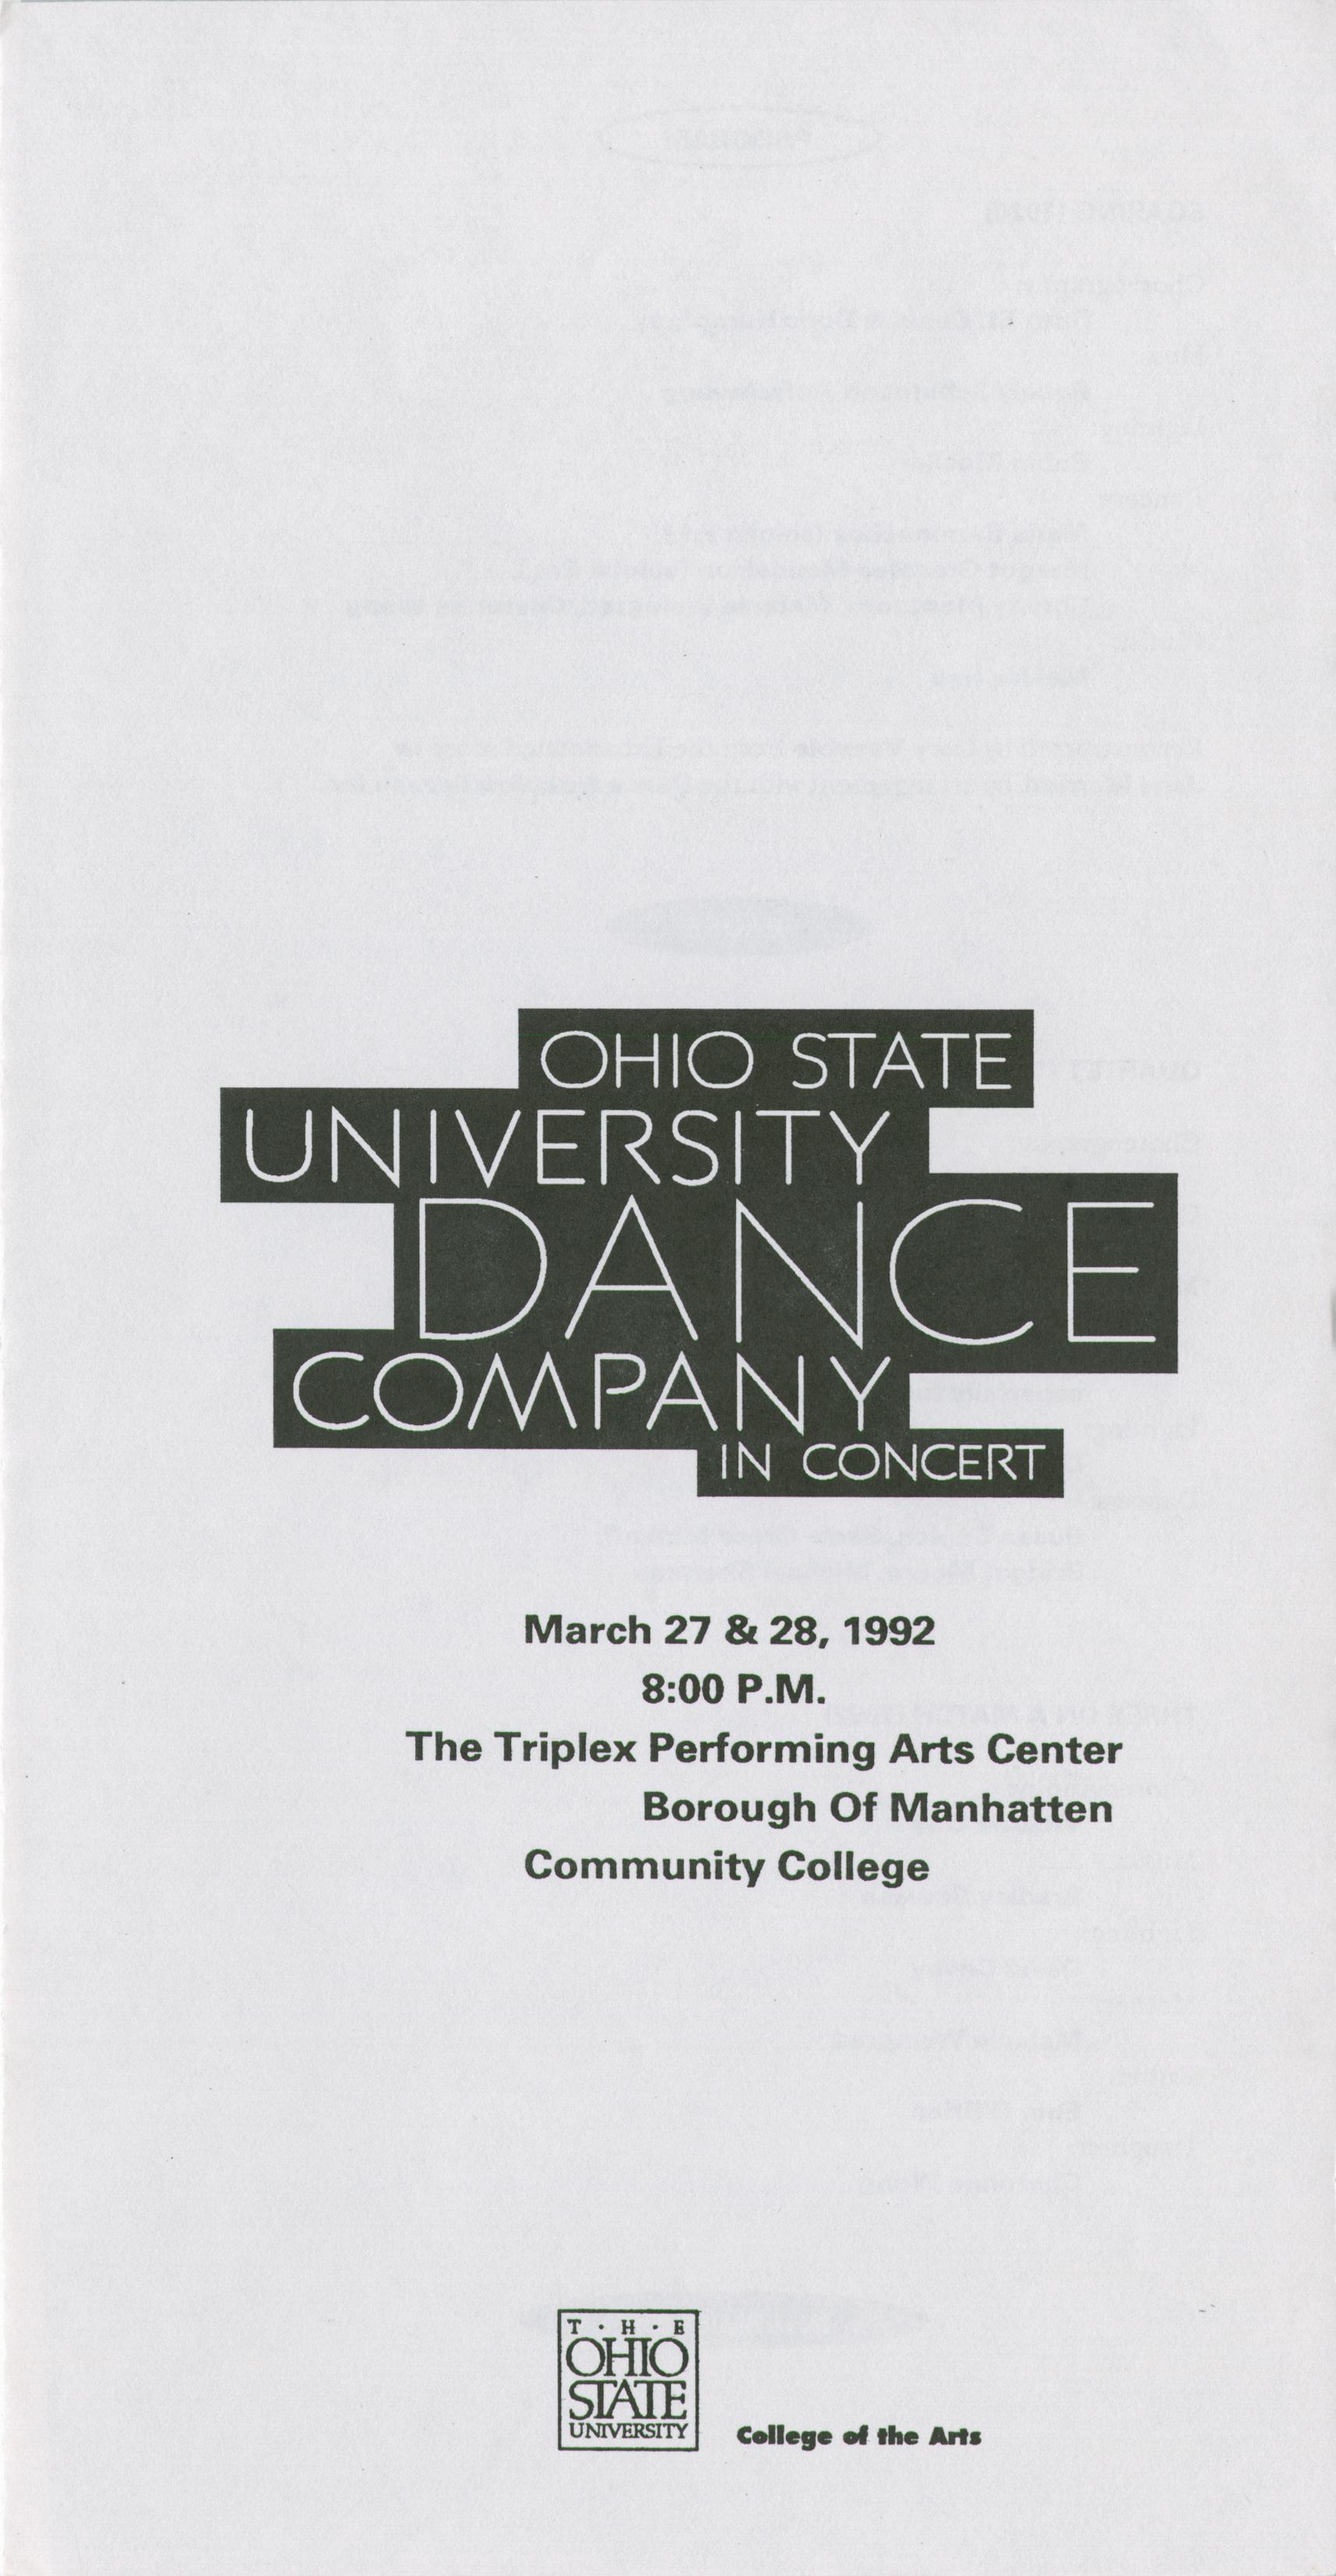 UDC_1992.2_DancePrograms-022-001.jpg